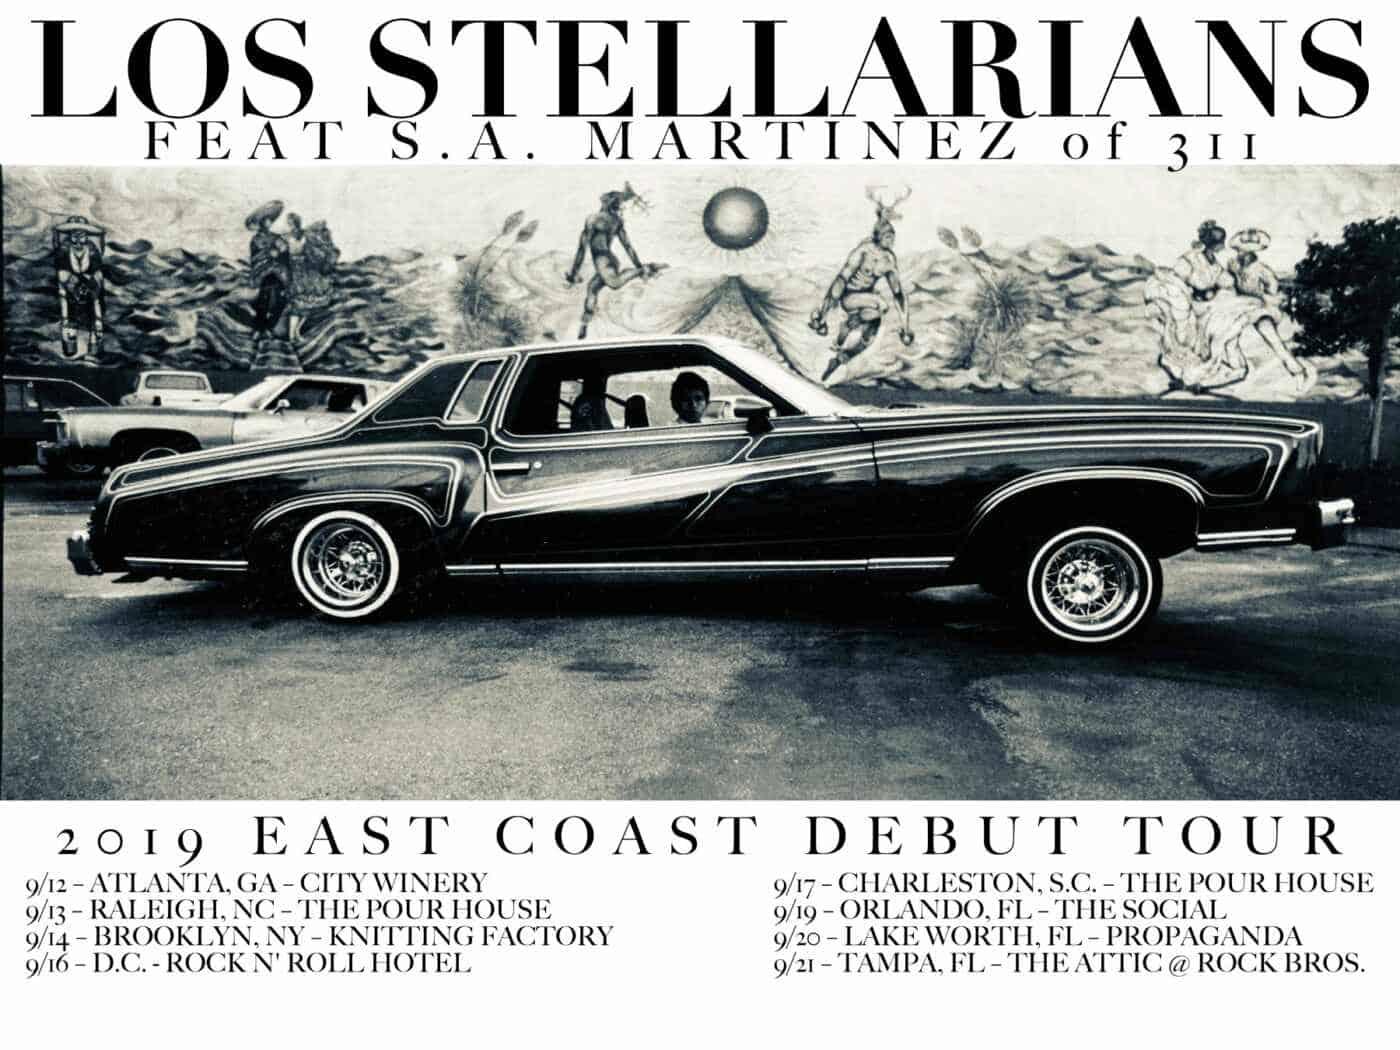 Tour Los Stellarians